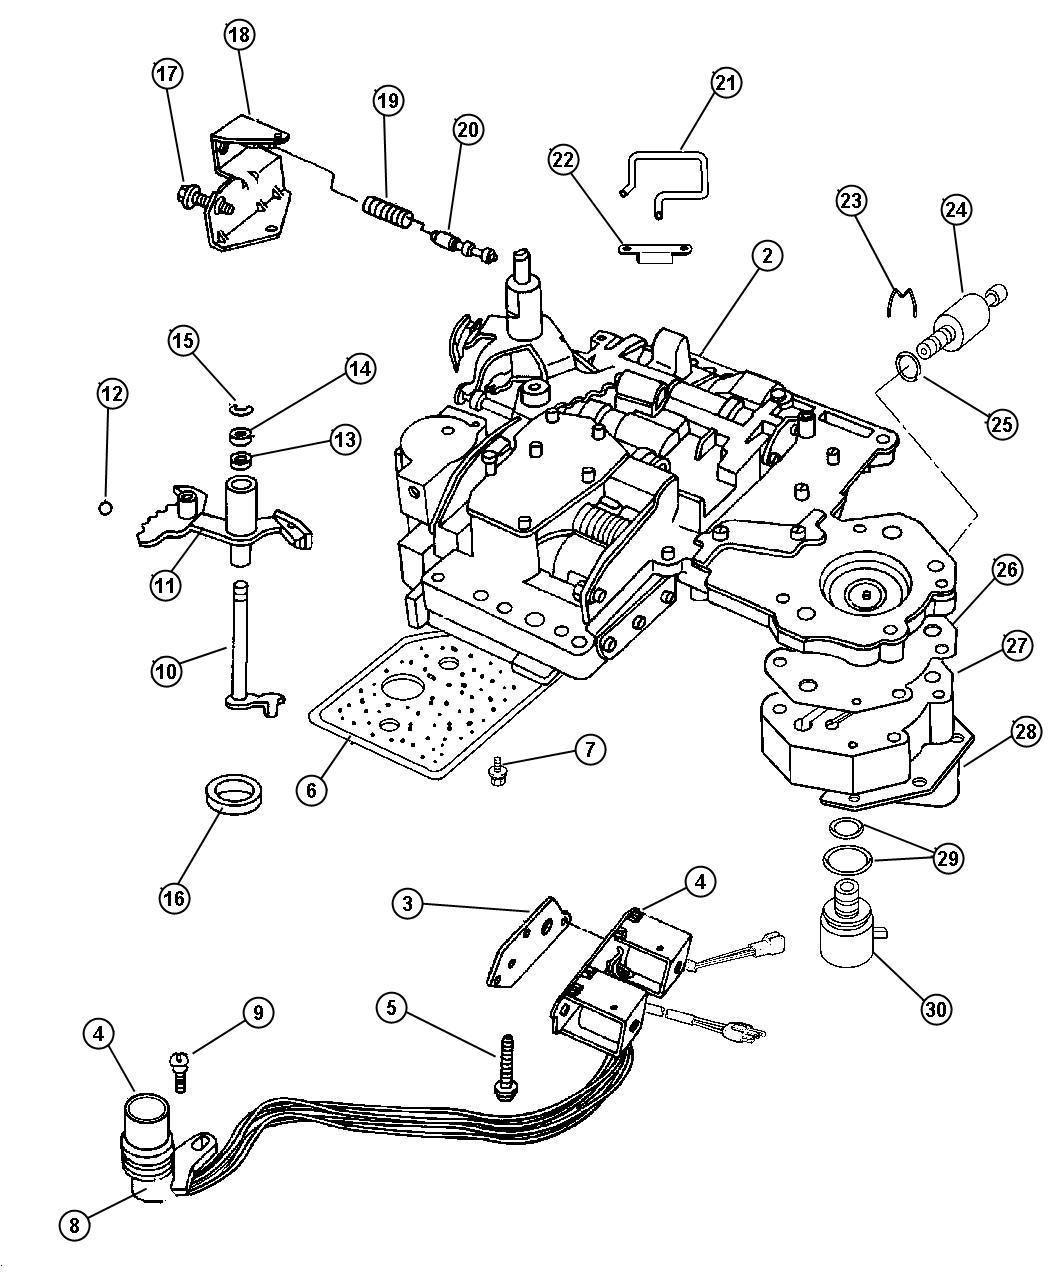 Dodge Durango R T 5 9l V8 Mpi 4 Spd Automatic 46re